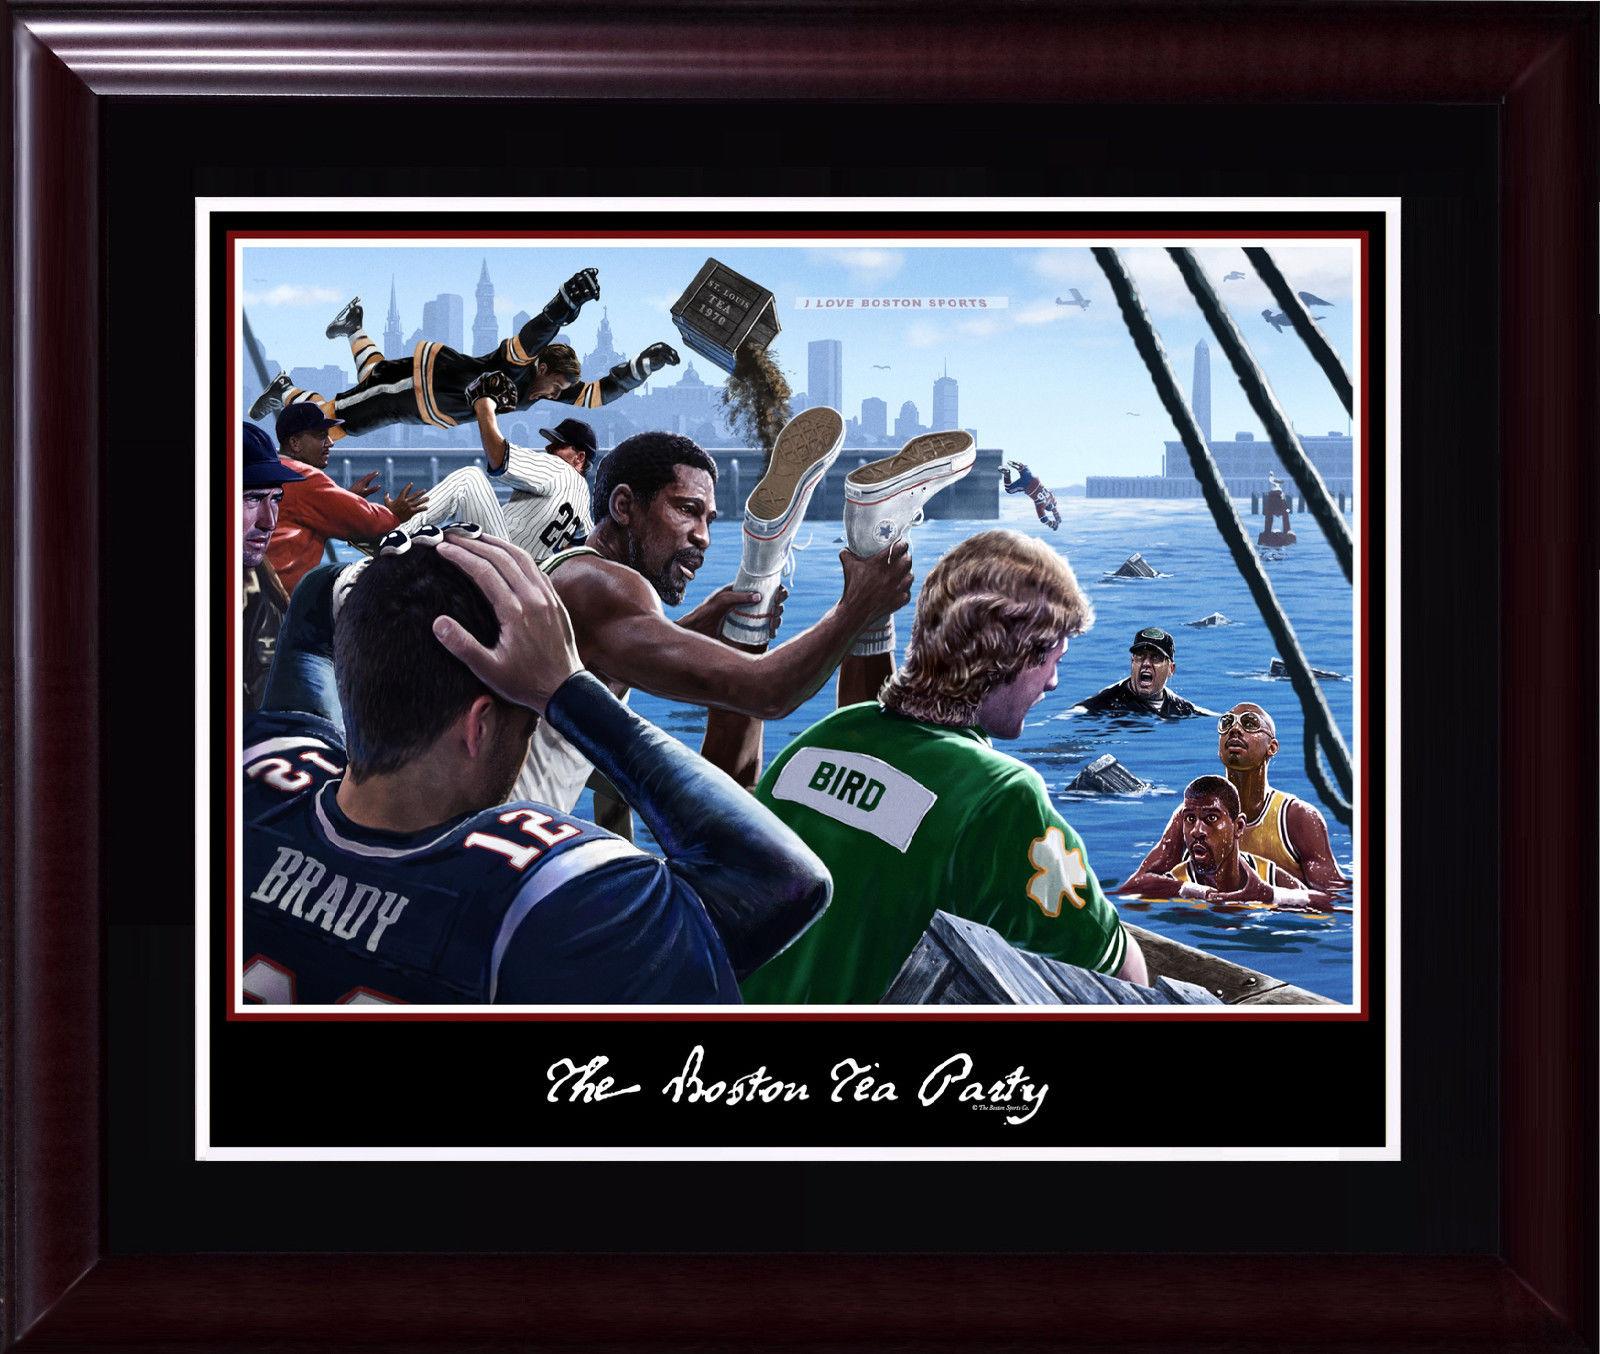 Boston Tea Party 16×20 photo framed Red Sox Celtics Patriots Tom Brady